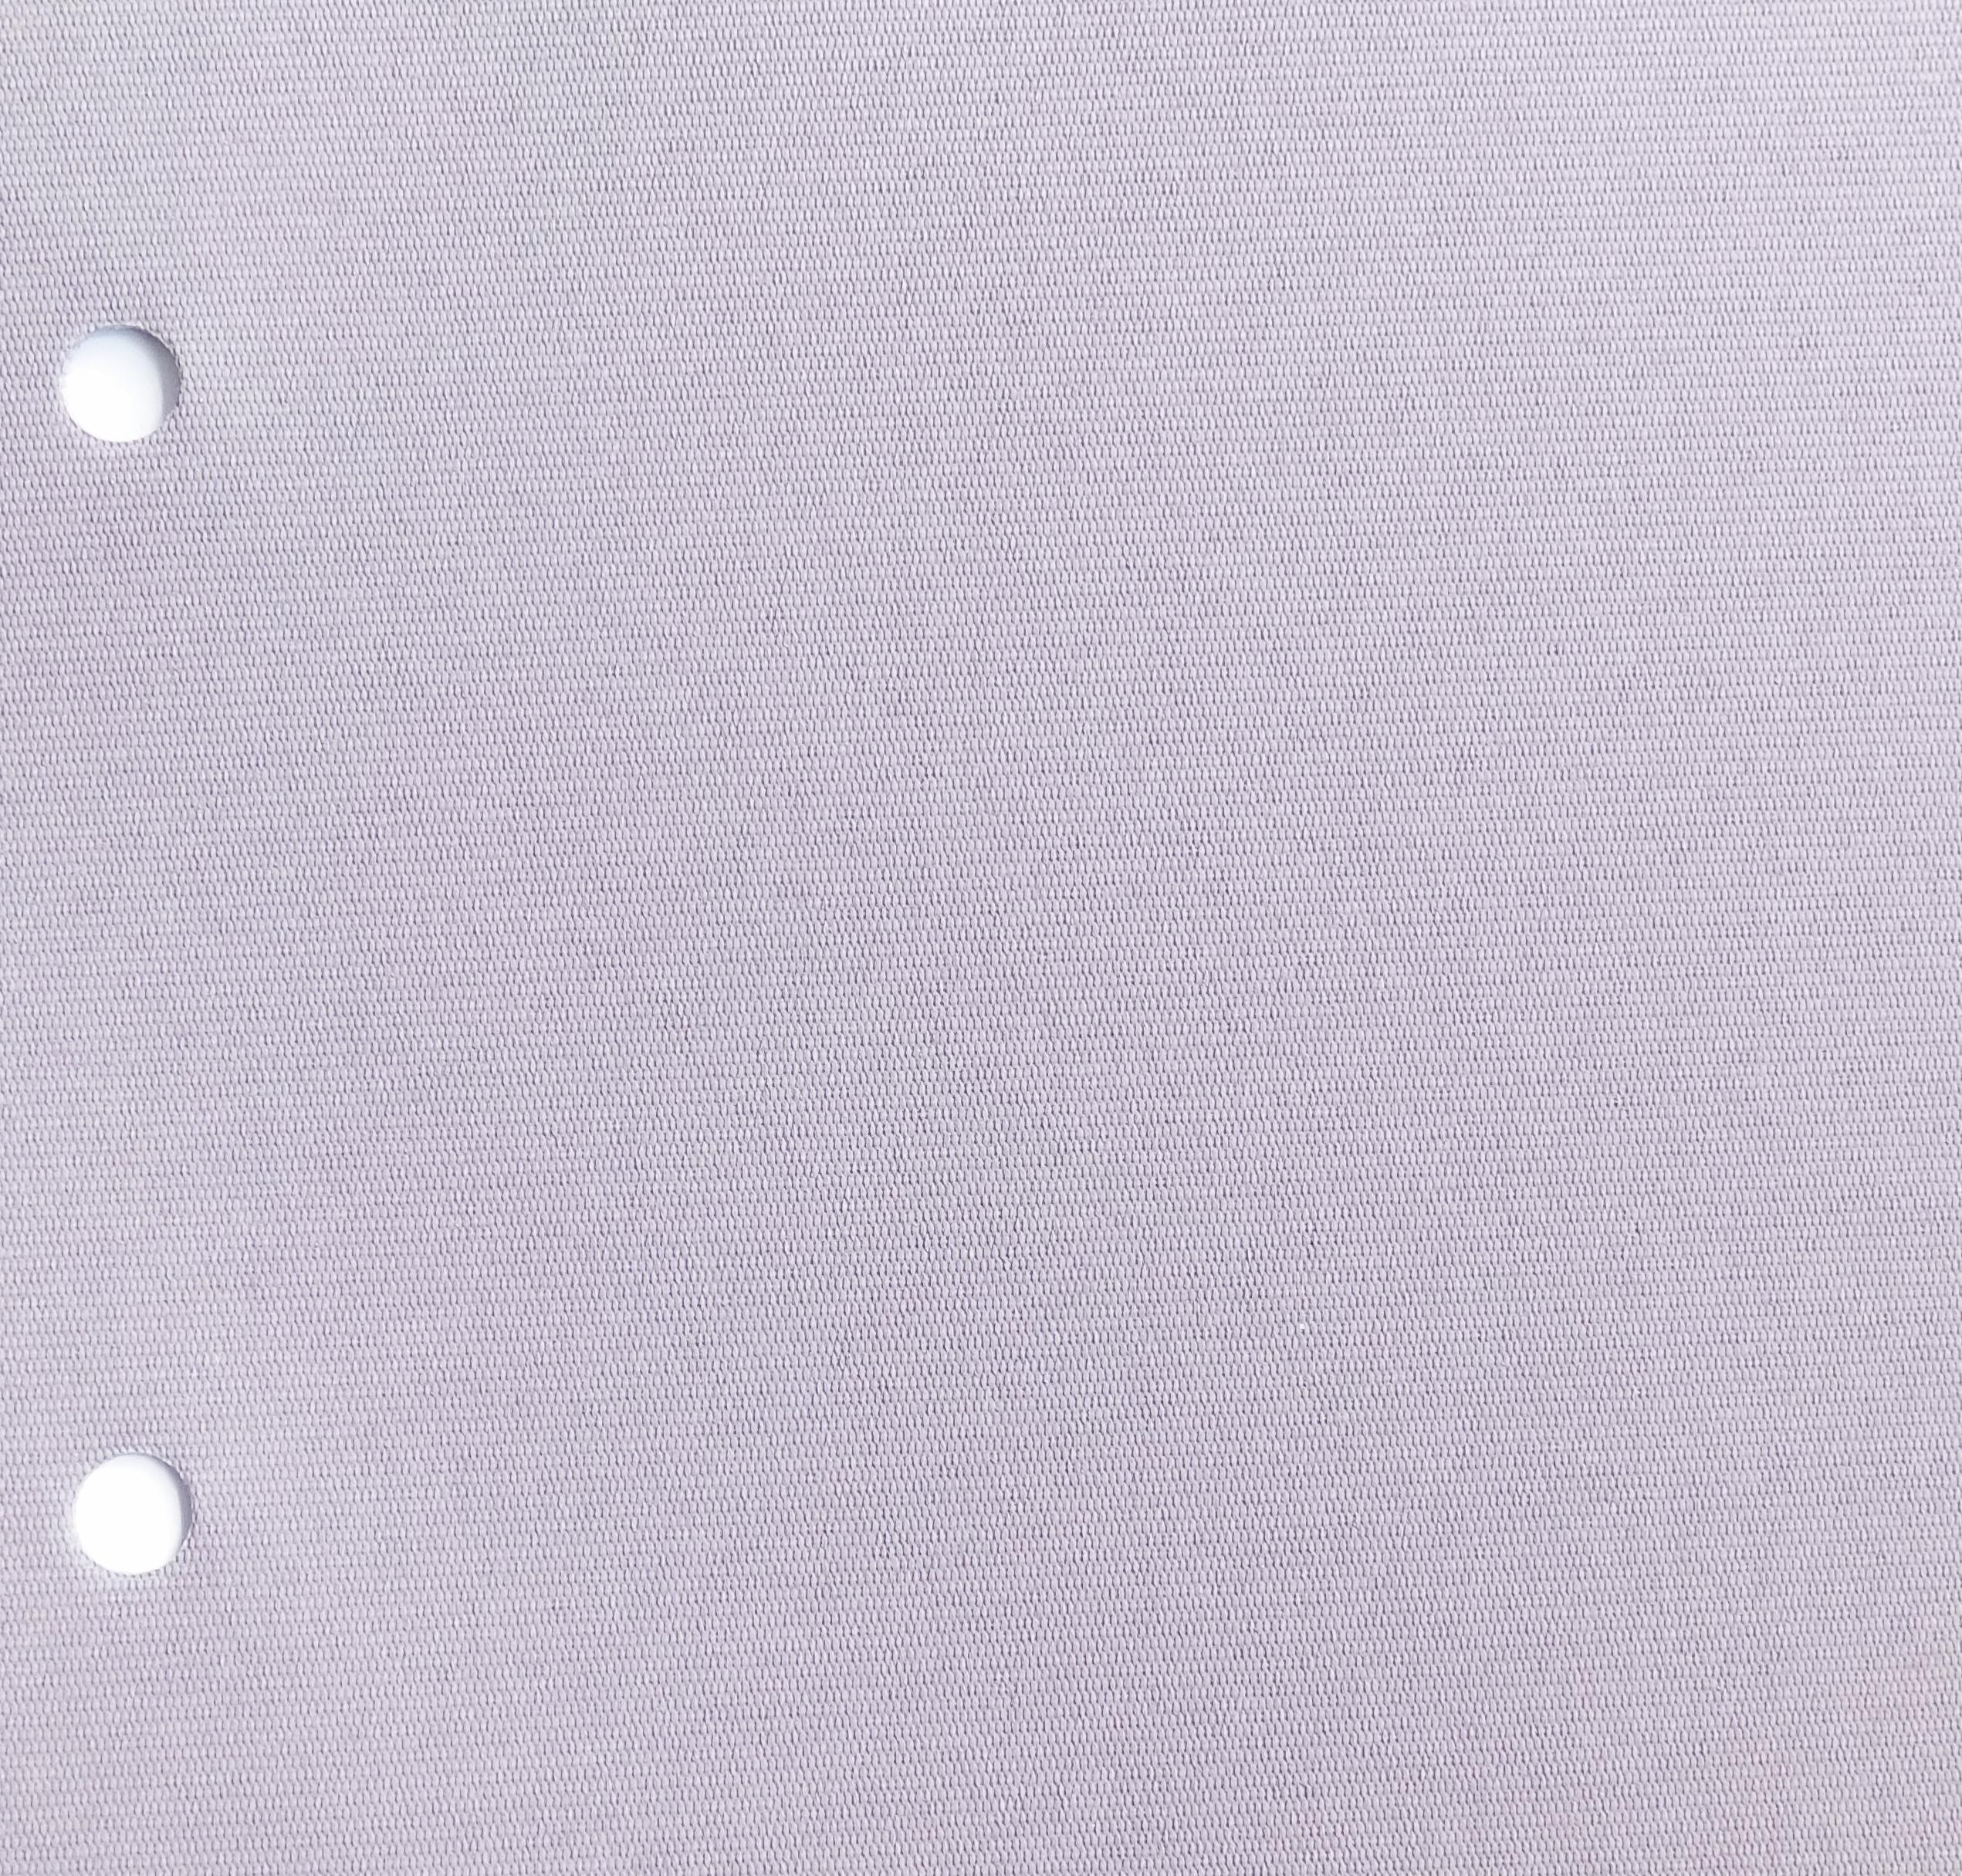 Palette Lavender Blind fabric